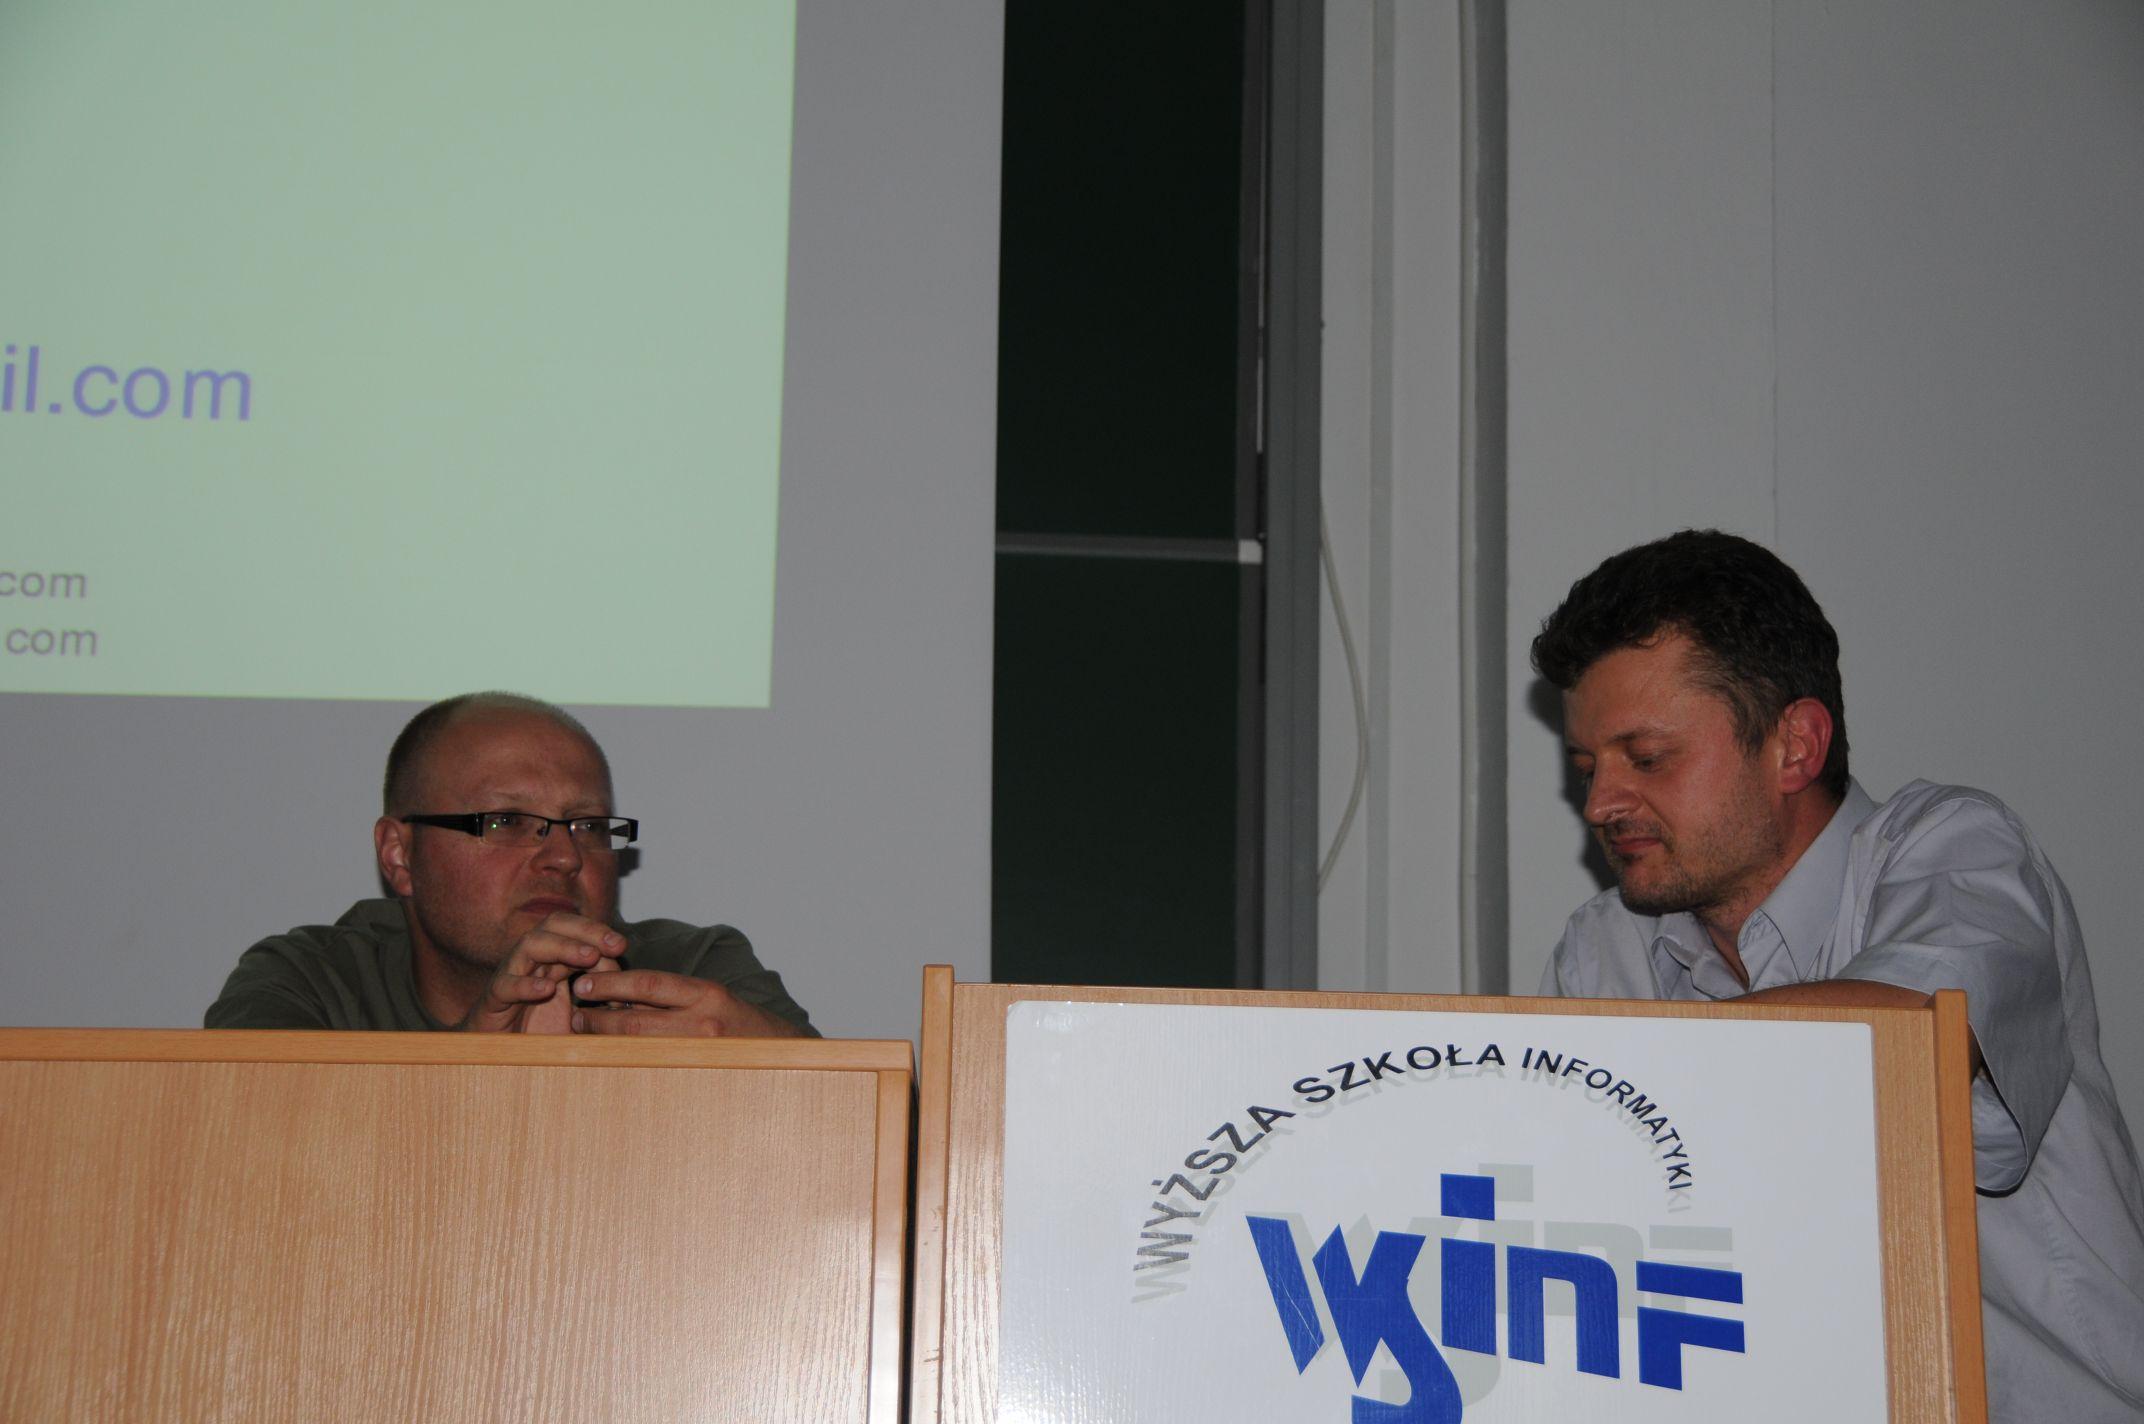 Wieczór z Open Source 2008